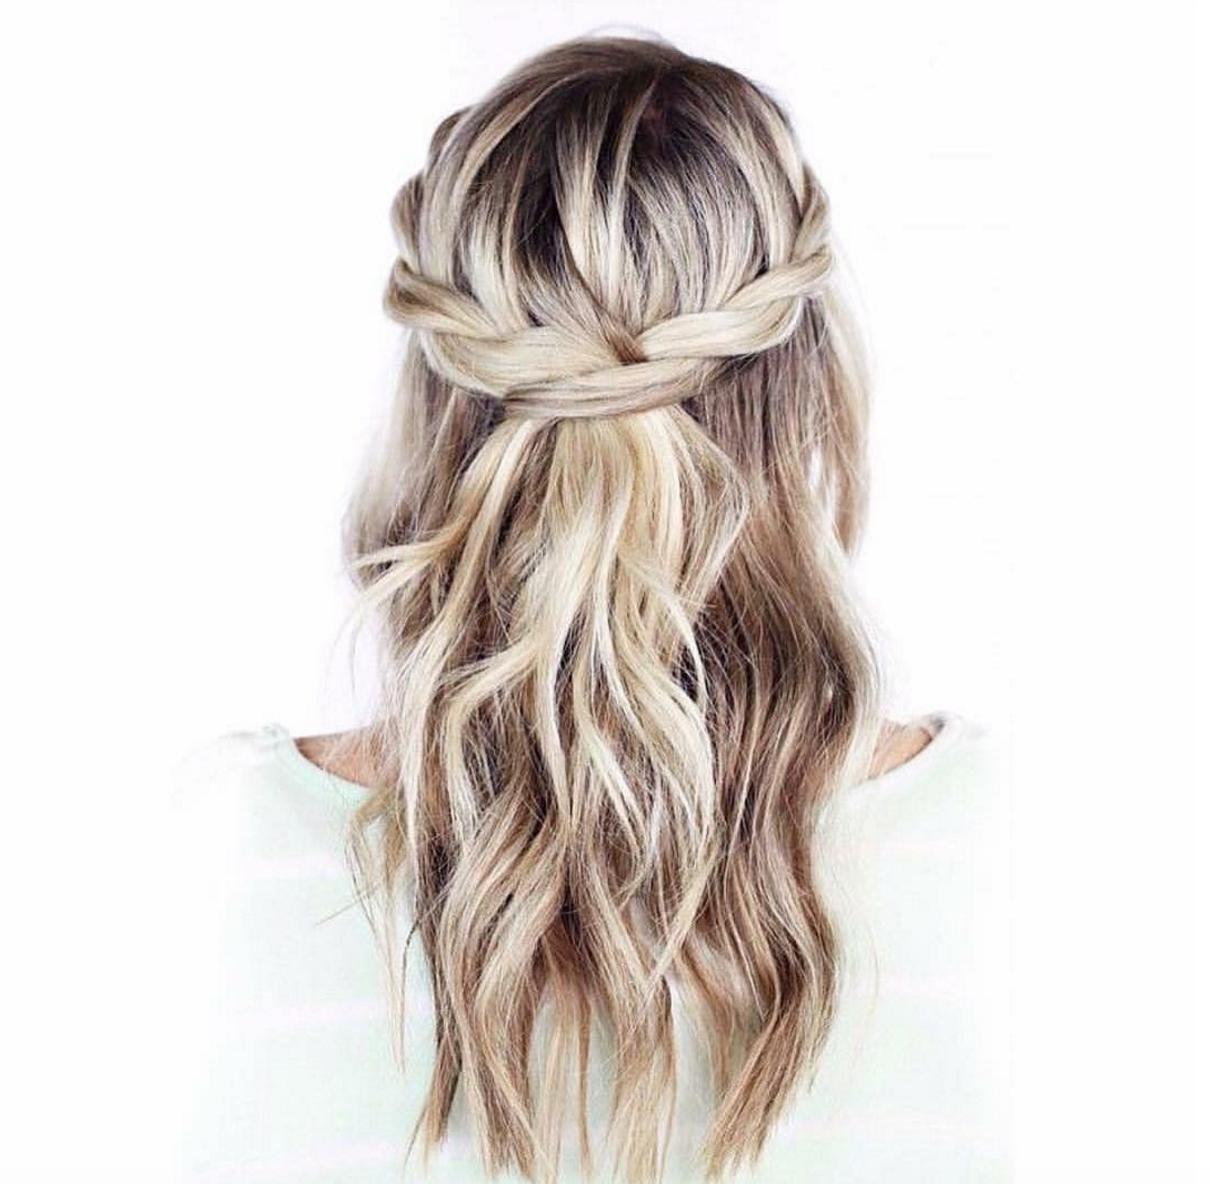 bridal braid | pretty. | Pinterest | Bridal braids, Night hair and ...